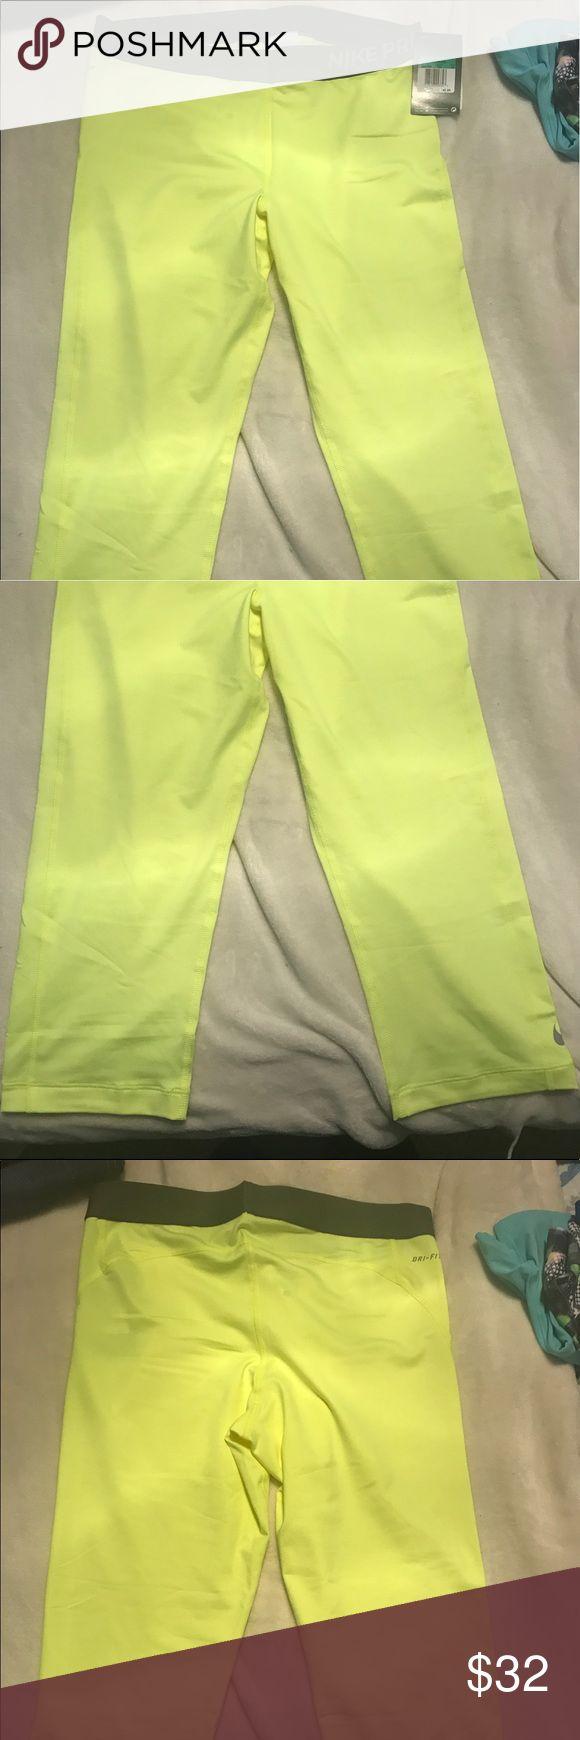 Neon yellow Nike Capri Brand new neon yellow Nike Capri pants. Size XL. Smoke free and pet free home Nike Pants Capris